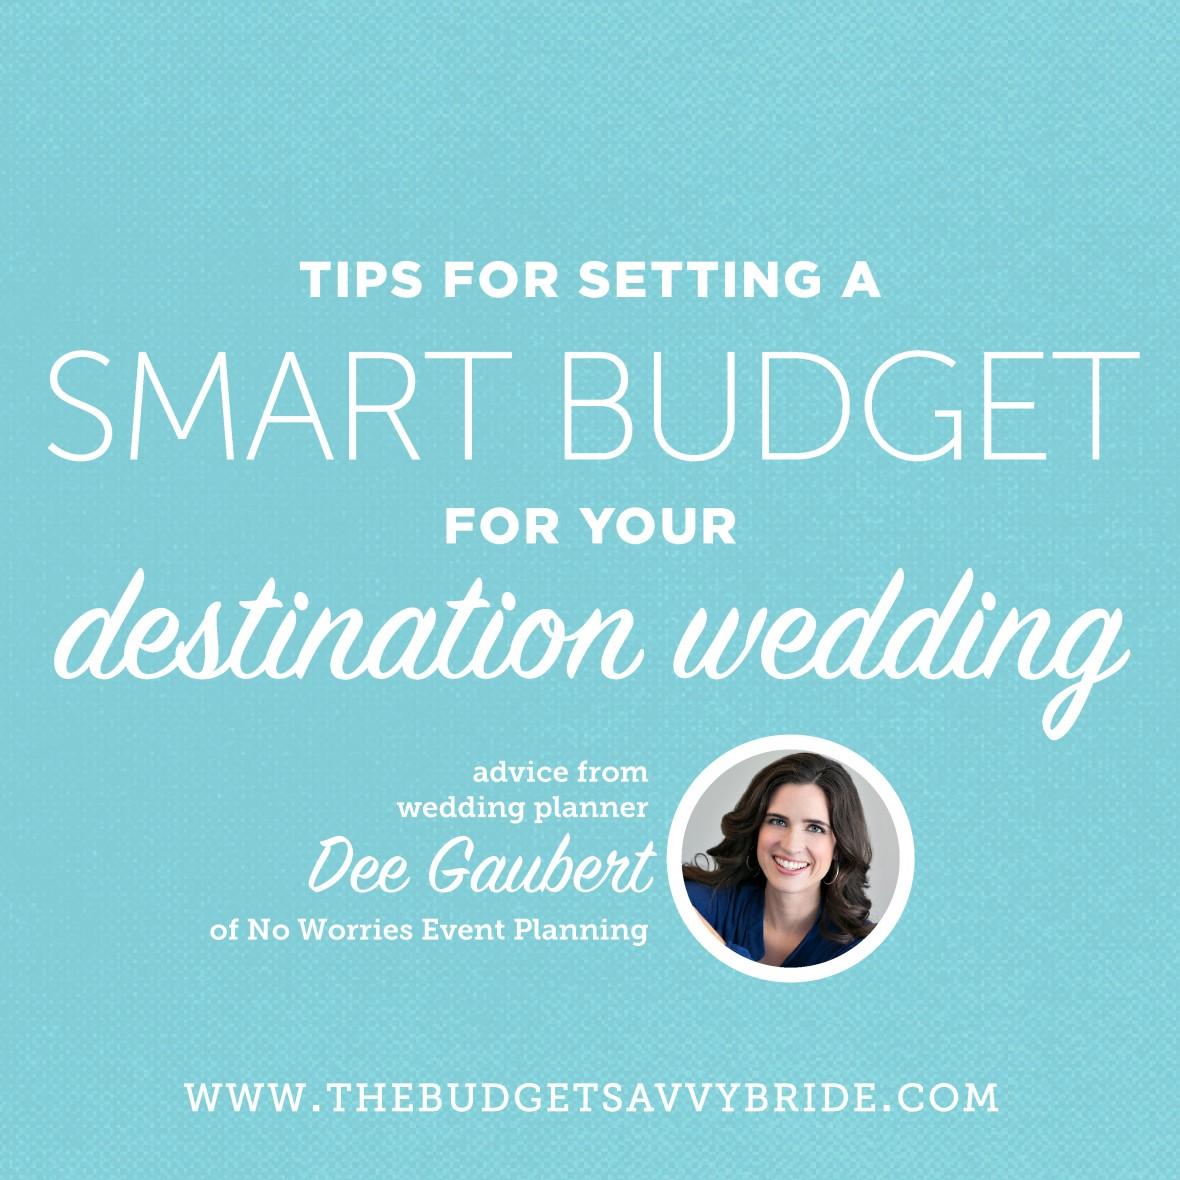 Setting a smart budget for your destination wedding